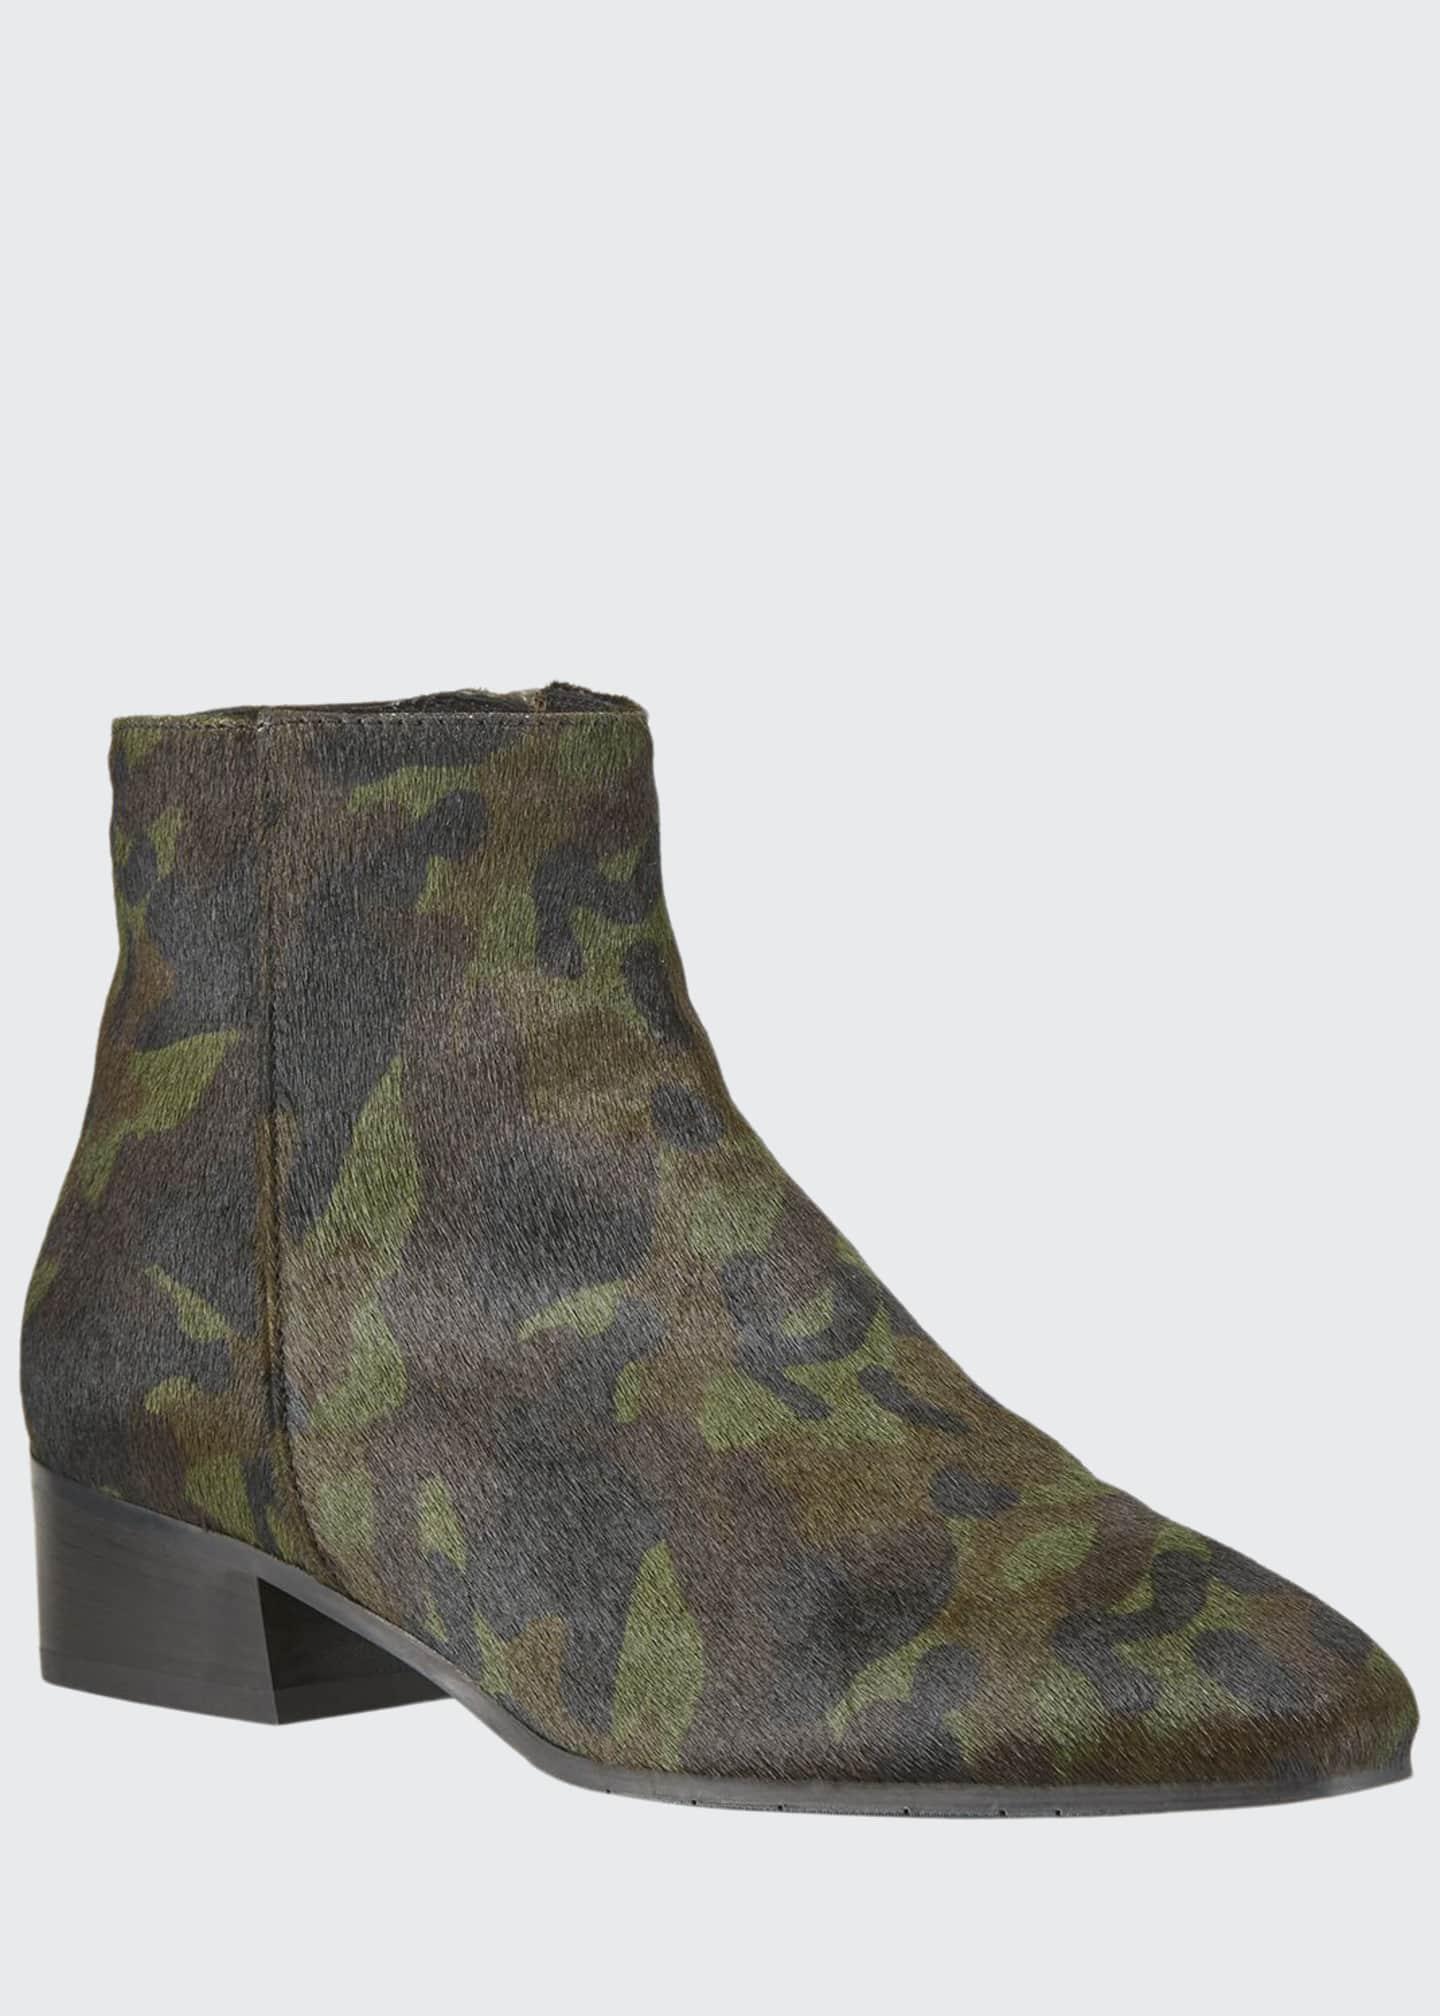 Aquatalia Fuoco Leopard-Print Booties